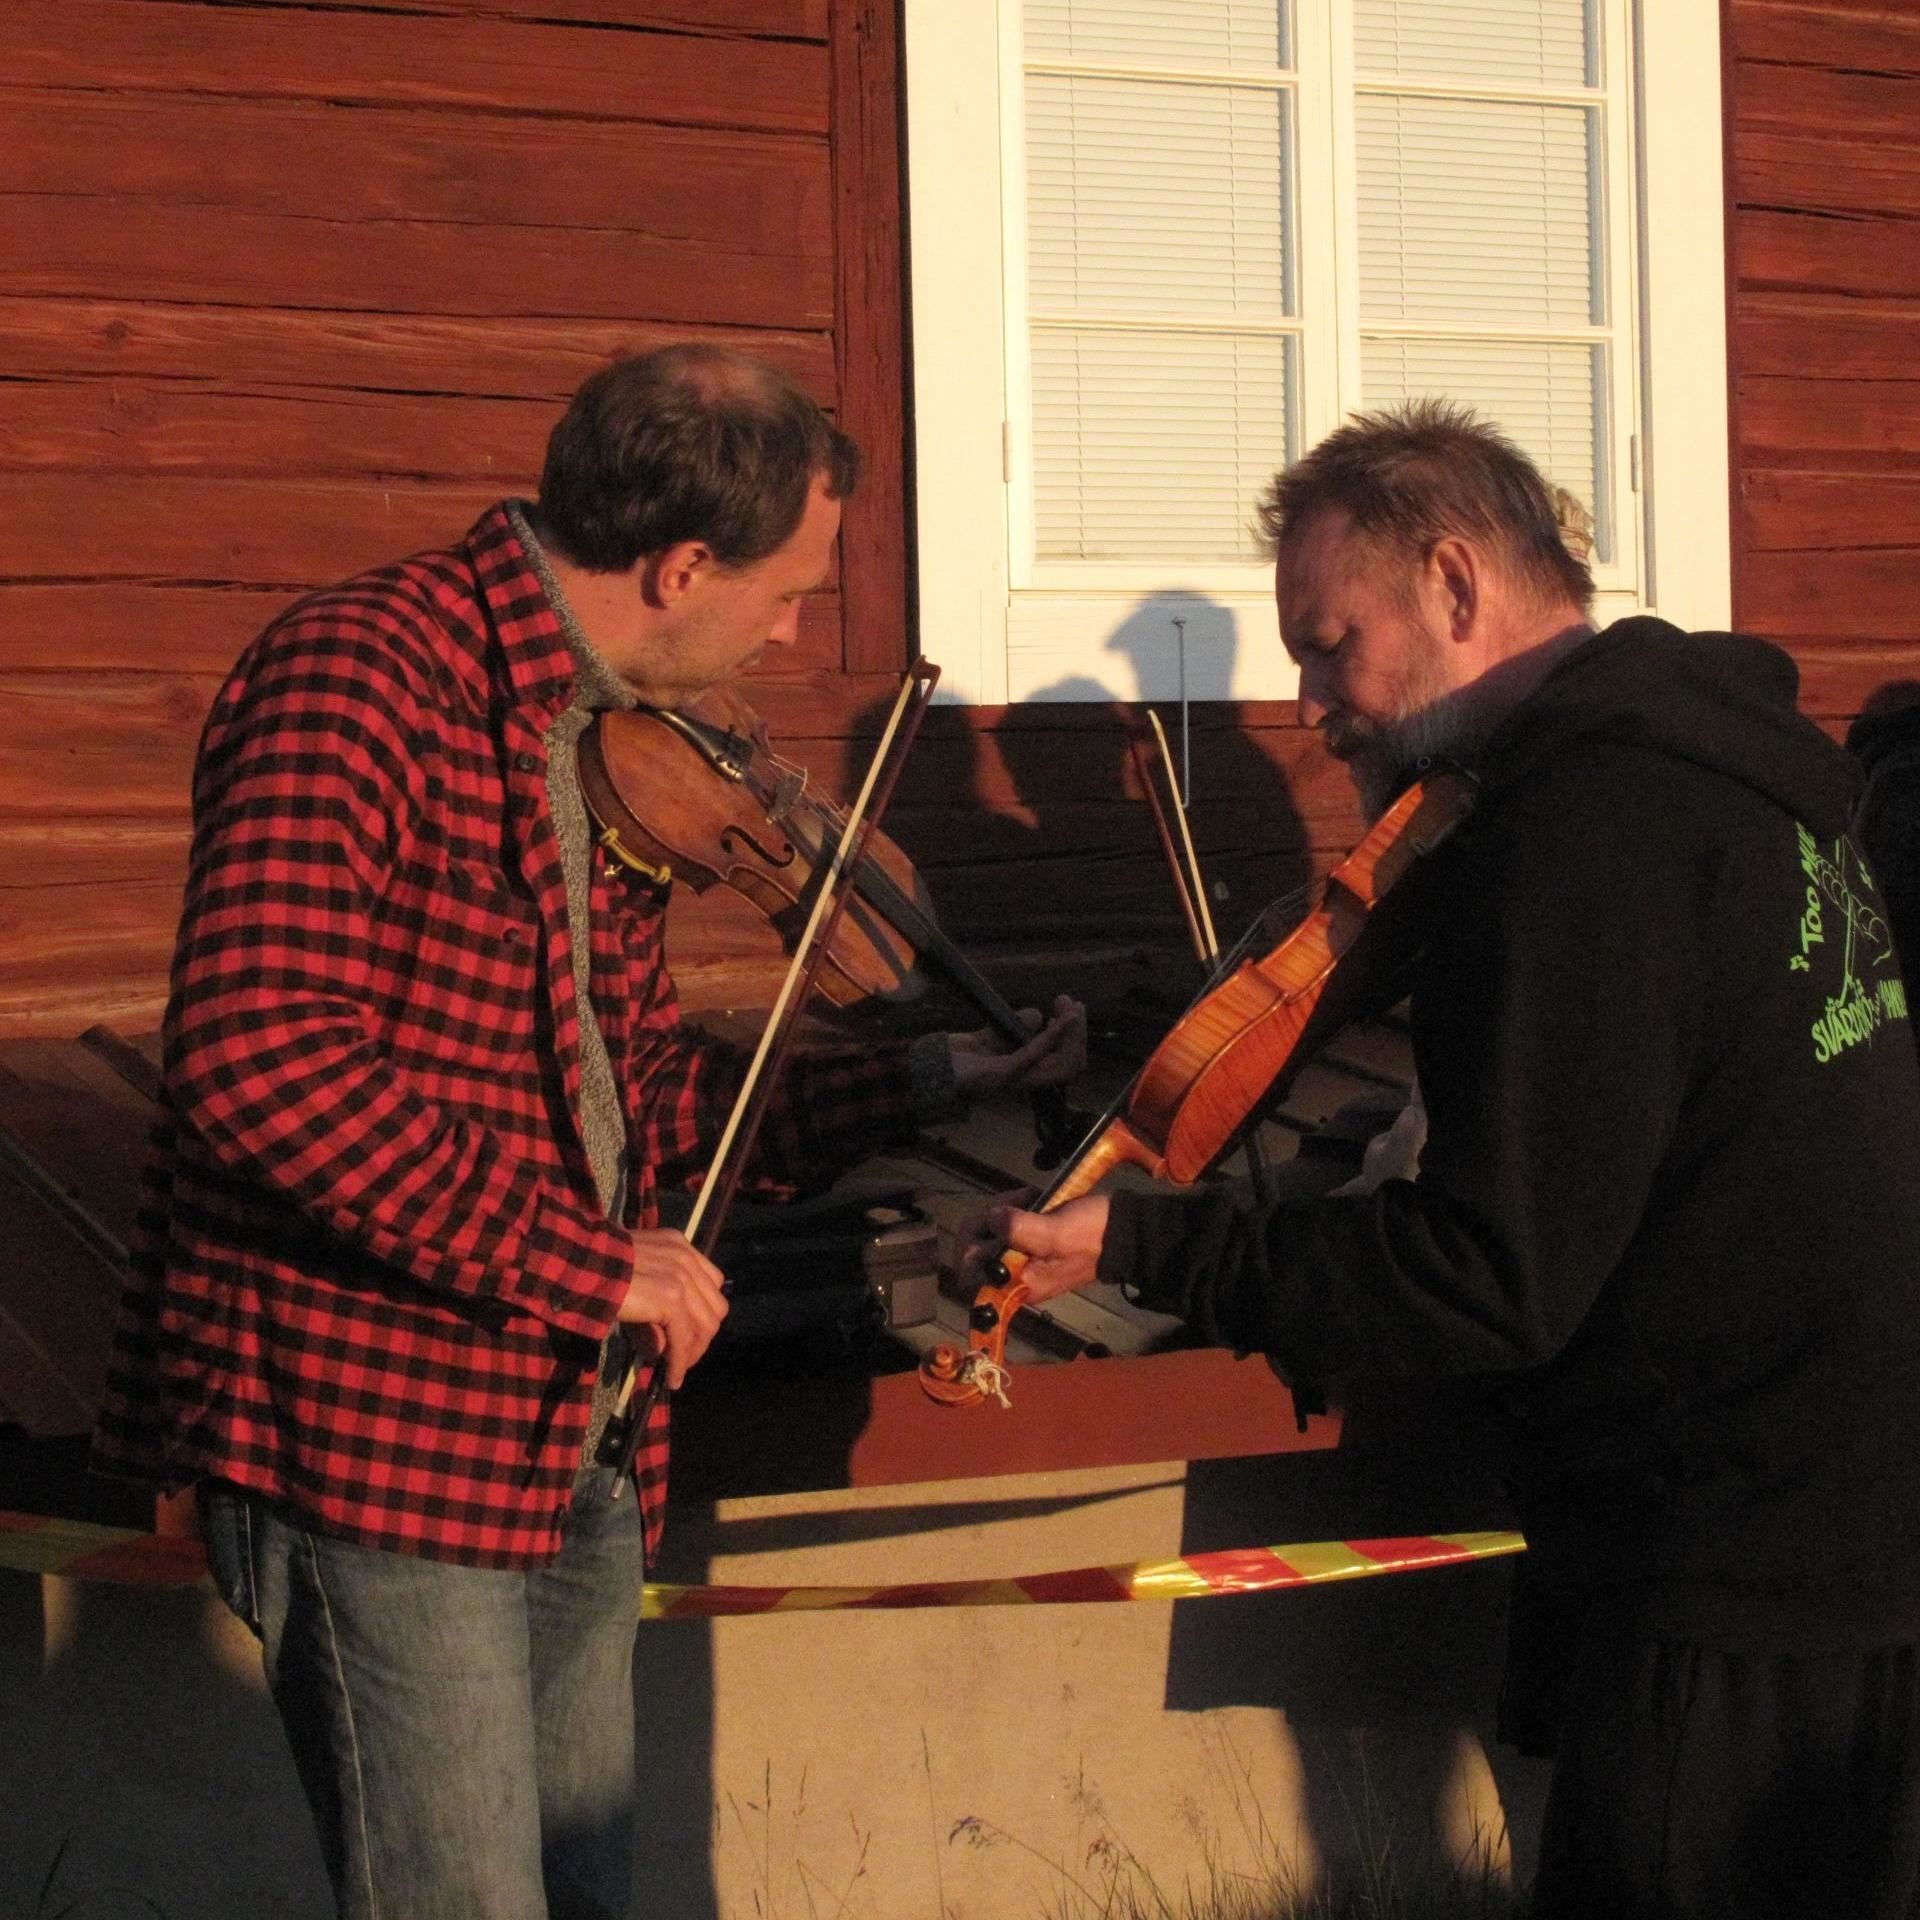 Konsert med Åke Wänn, Esbjörn Hazelius & Staffan Lindfors